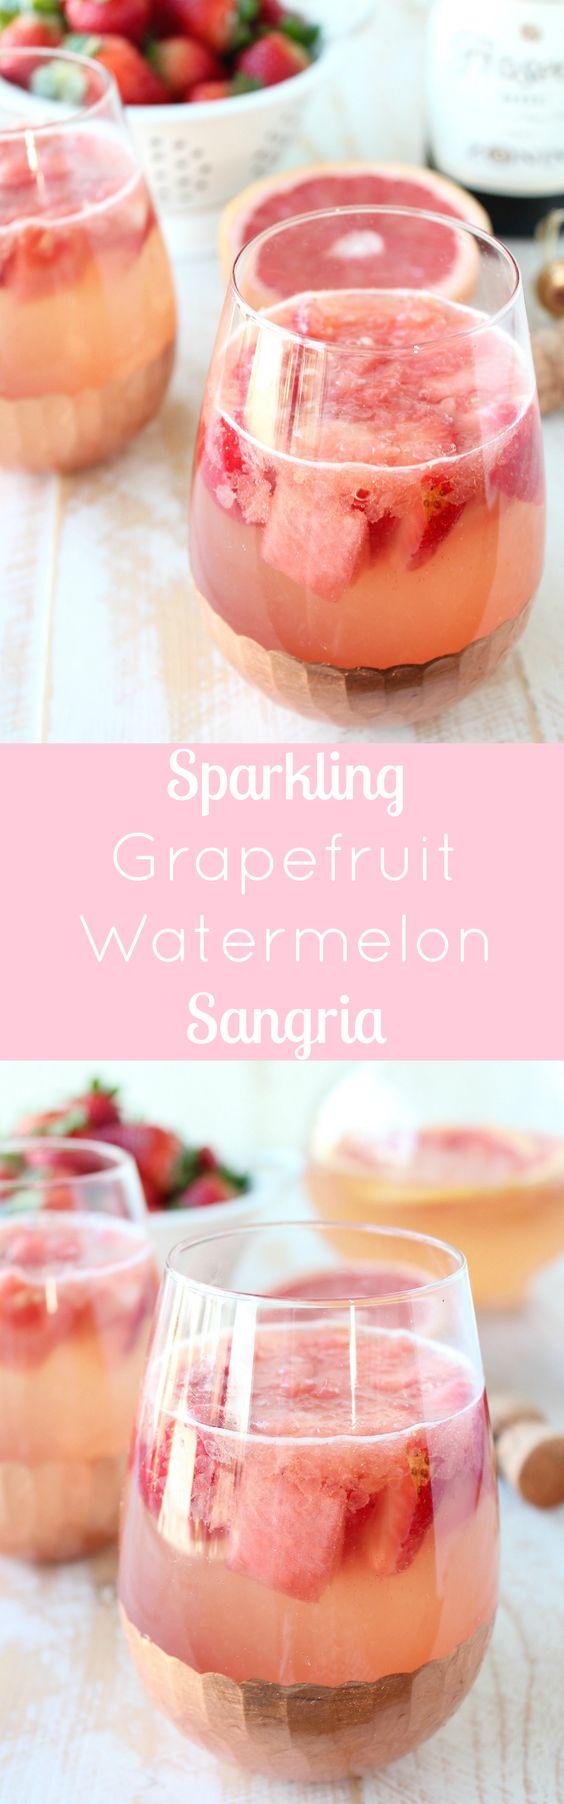 Sparkling Grapefruit Watermelon Sangria   Recipe   Watermelon Sangria ...